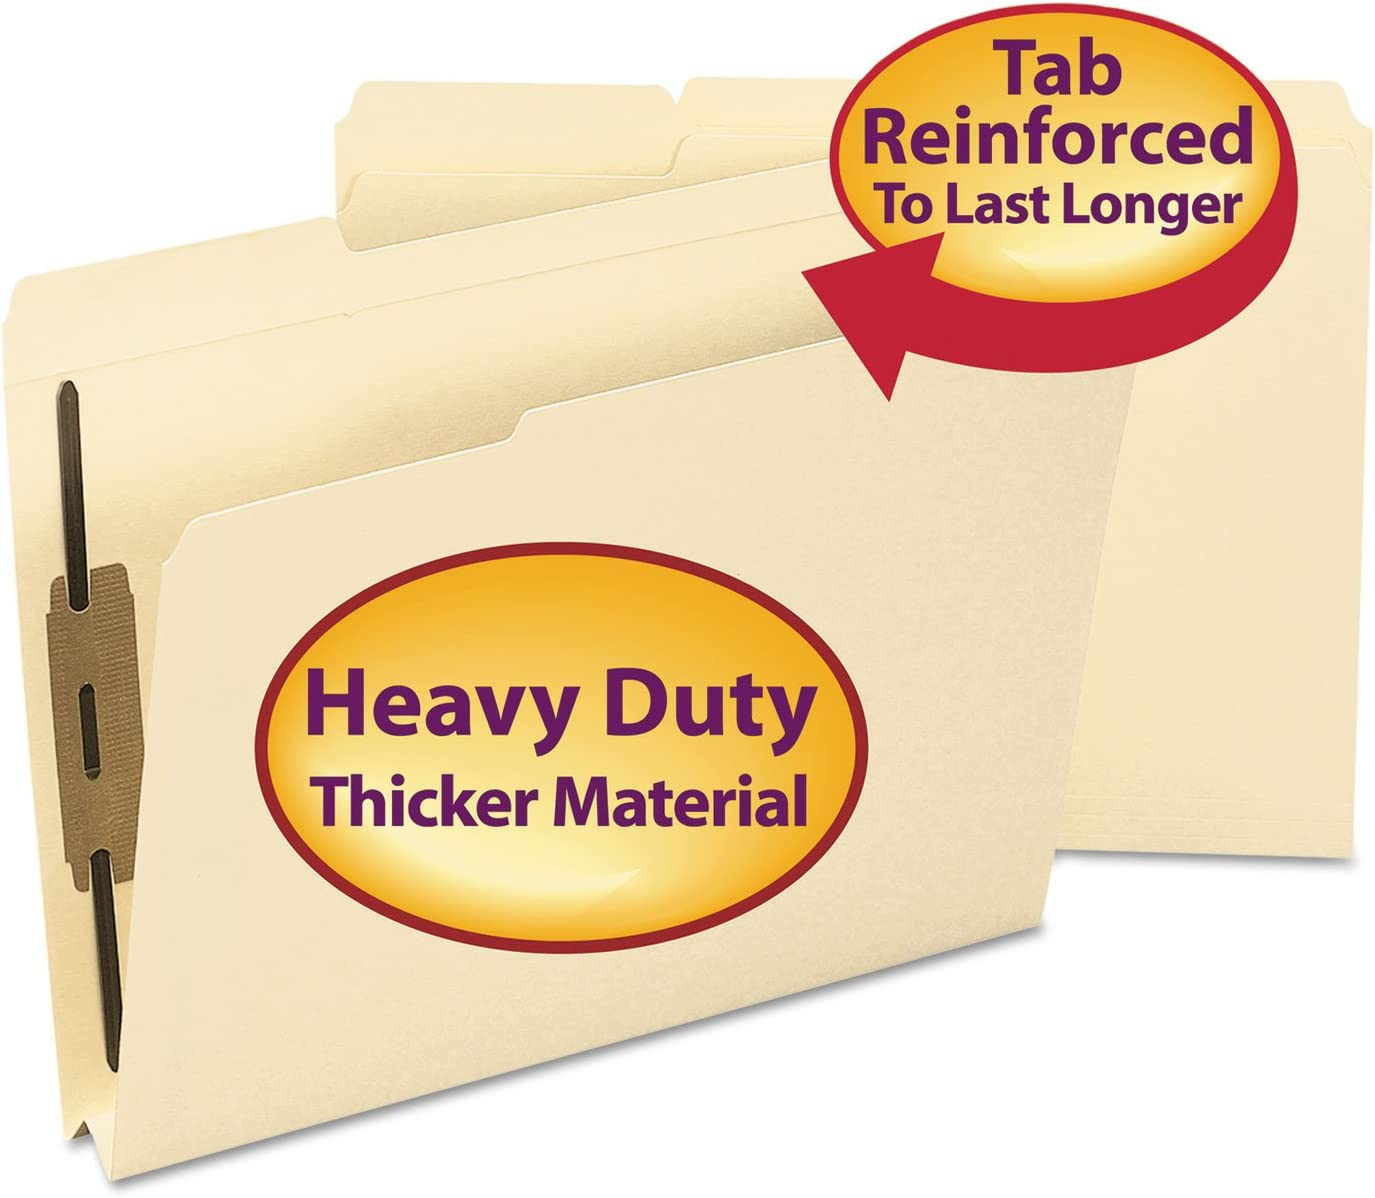 2 Fasteners Smead Fastener File Folder Reinforced 1//3-Cut Tab 1-1//2 Expansion Manila Letter Size 14595 50 per Box